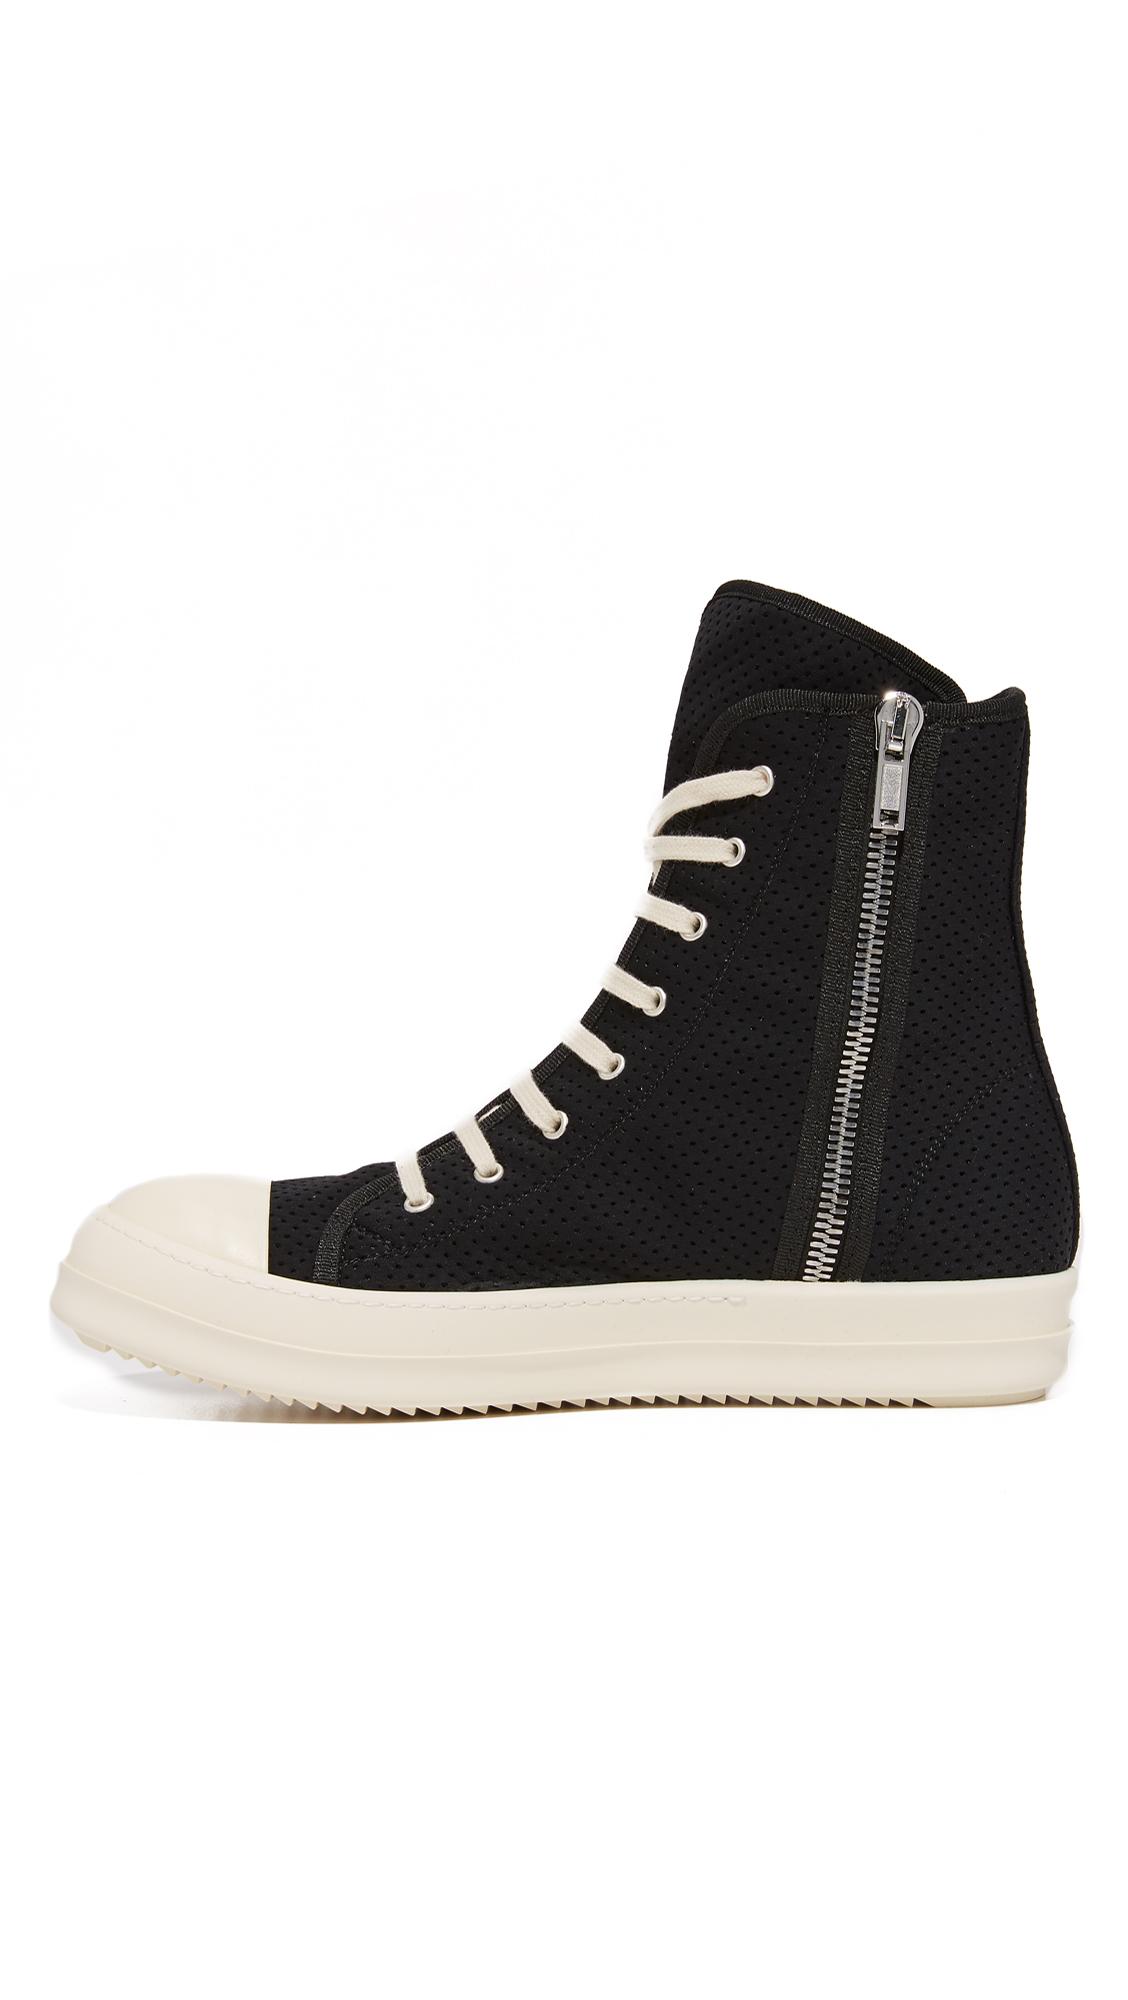 rick owens drkshdw high top sneakers black modesens. Black Bedroom Furniture Sets. Home Design Ideas